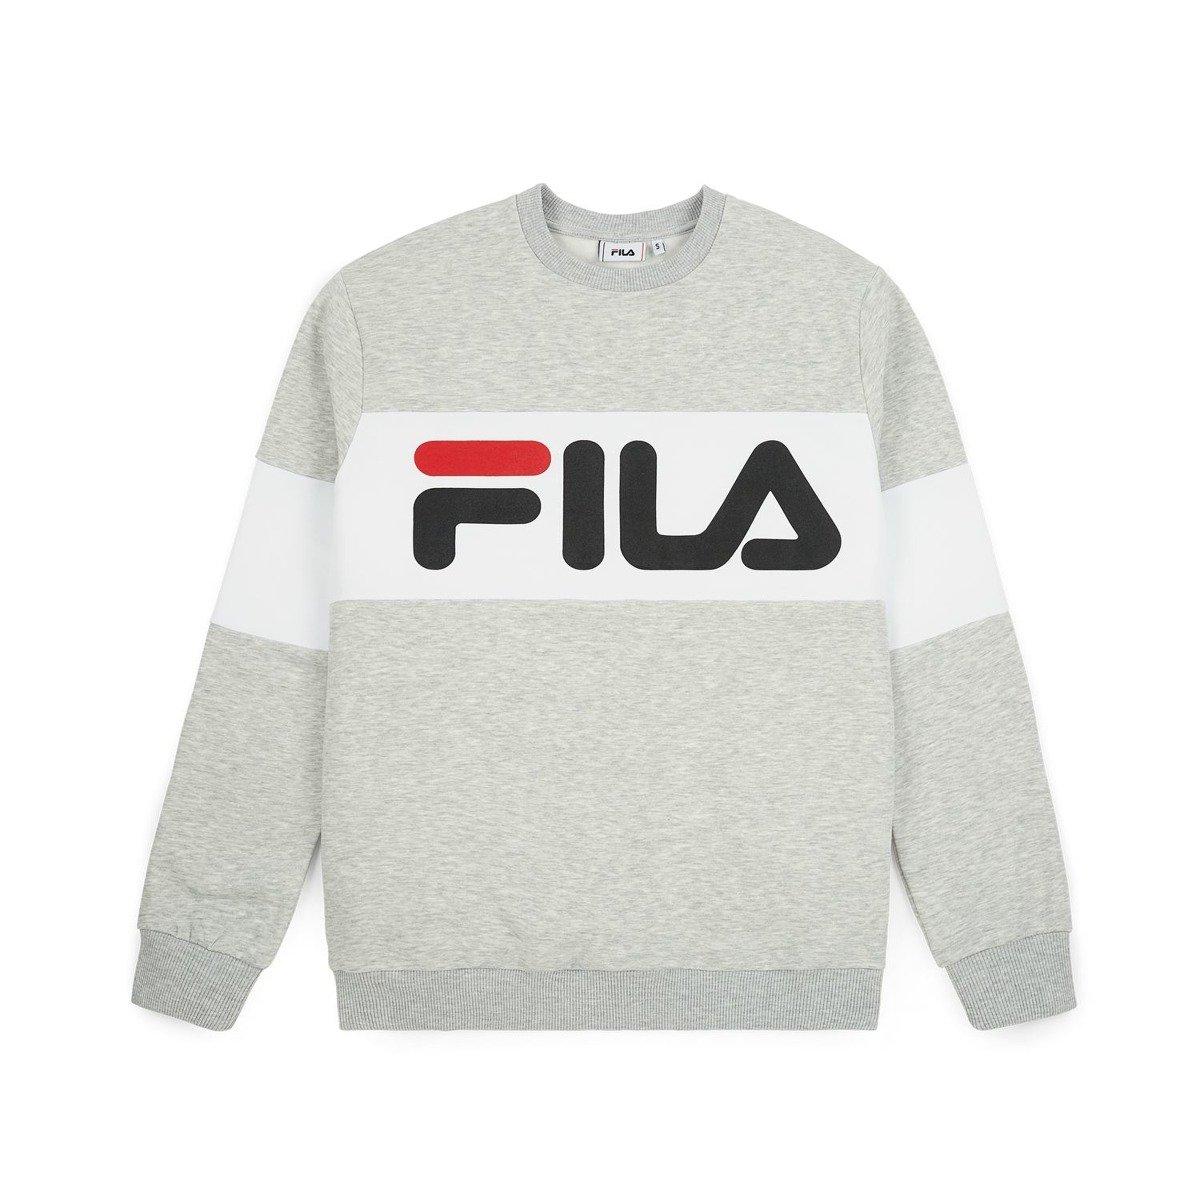 cf24d307b4a fila straight blocked crewneck grey | SALE \ Sale 50% -70% \  Sweatshirts/Hoods SALE \ Sale - 40% \ Sweatshirts/Hoods Clothes \ Bluzy \  Crewneck Brands ...